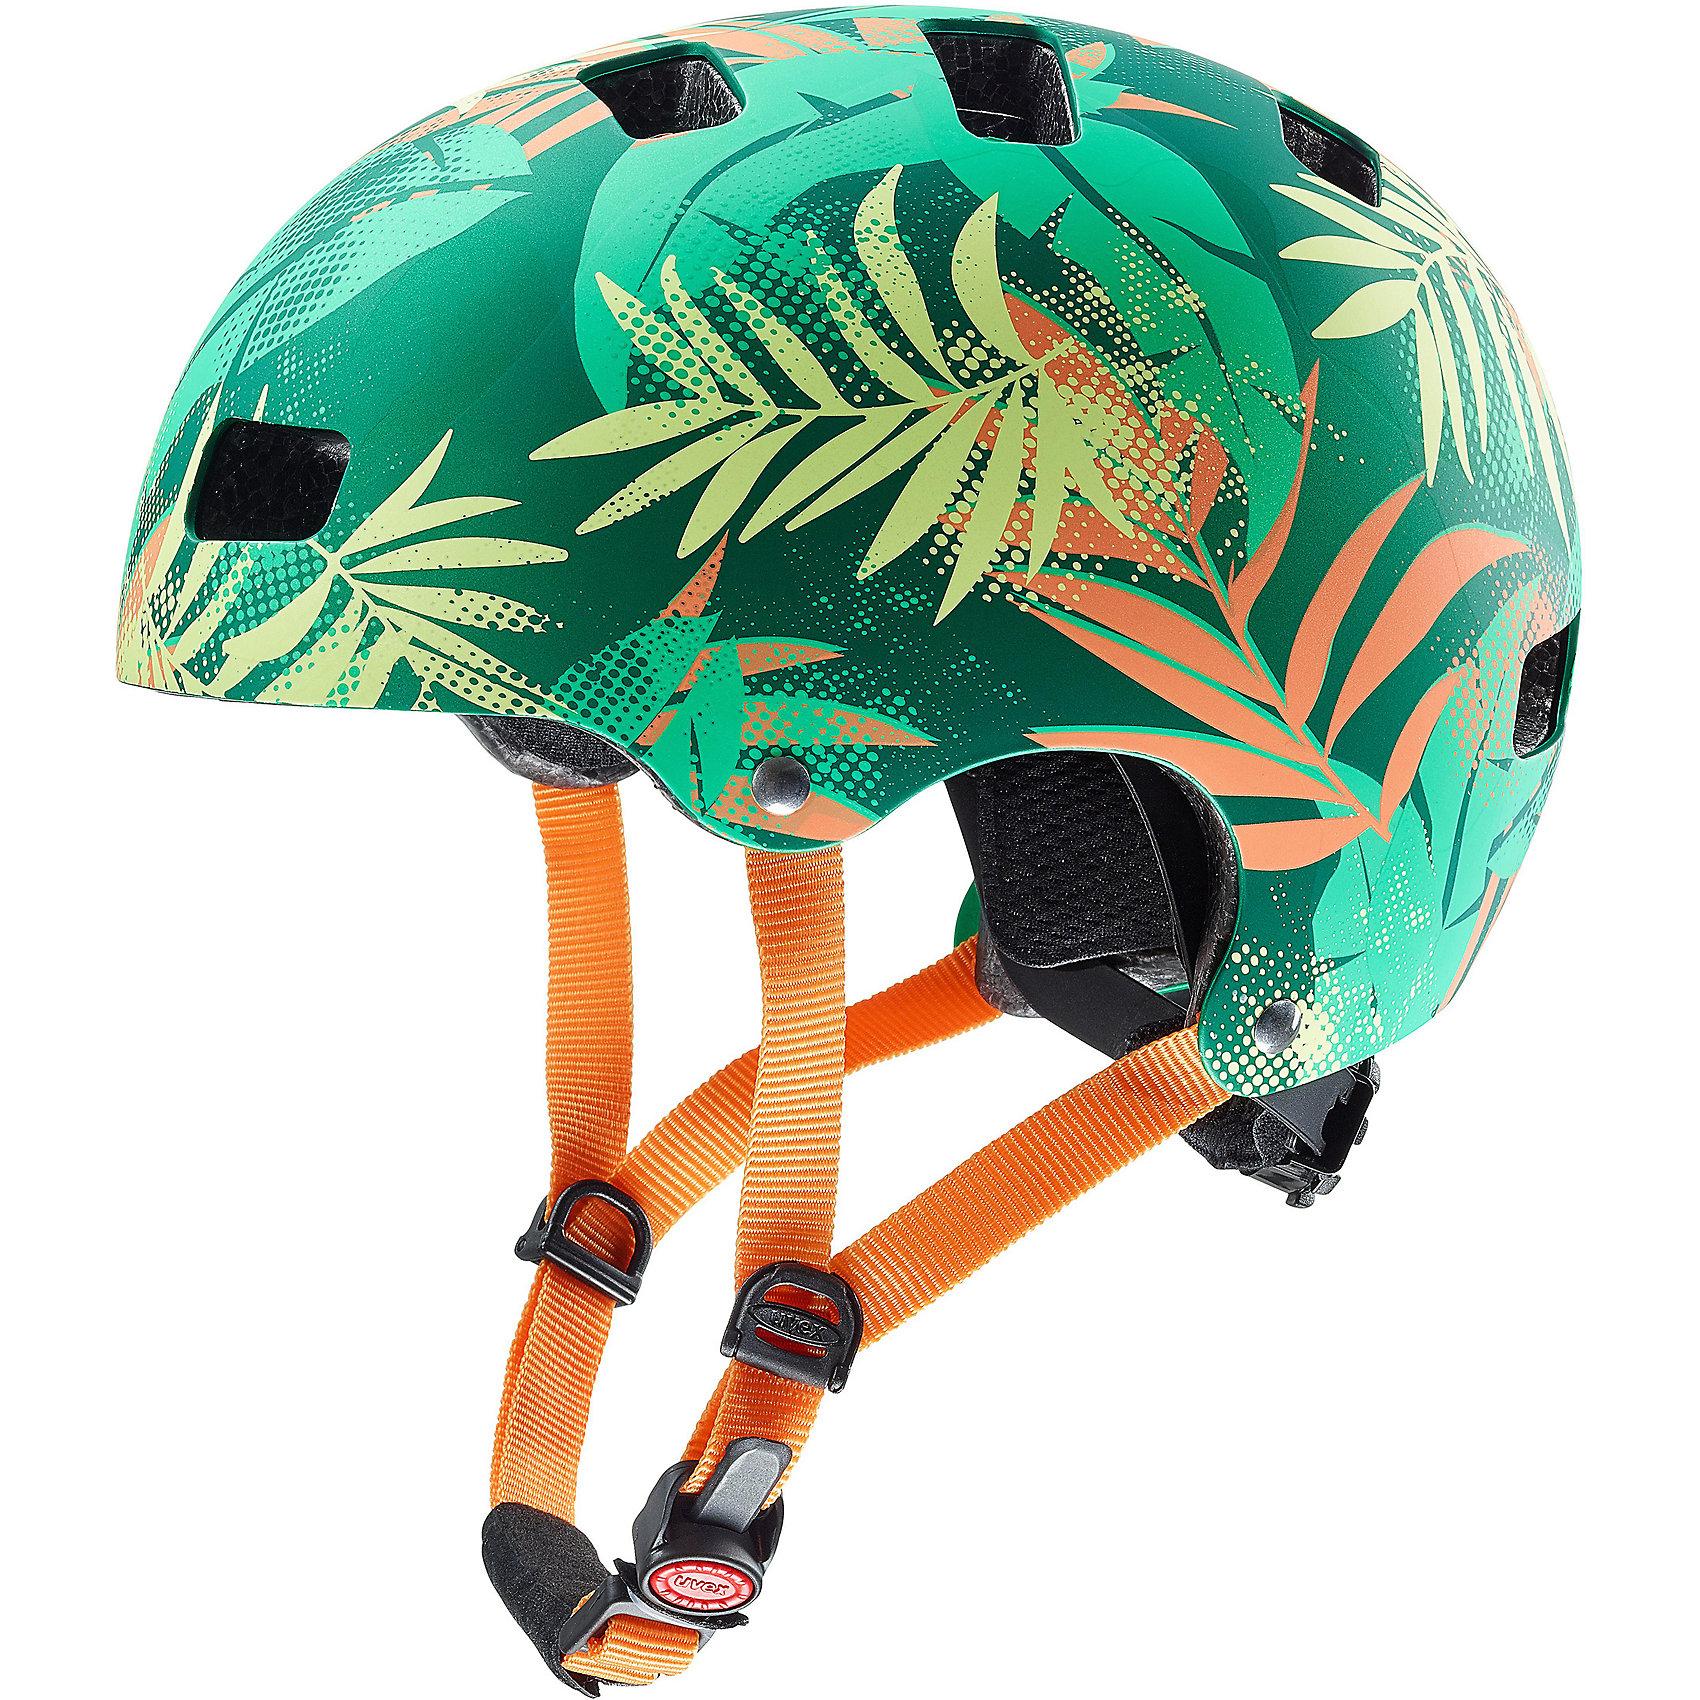 Neu uvex Fahrradhelm kid kid kid 3 cc dark rot 10642890 dunkelrot grün Orange c012f7